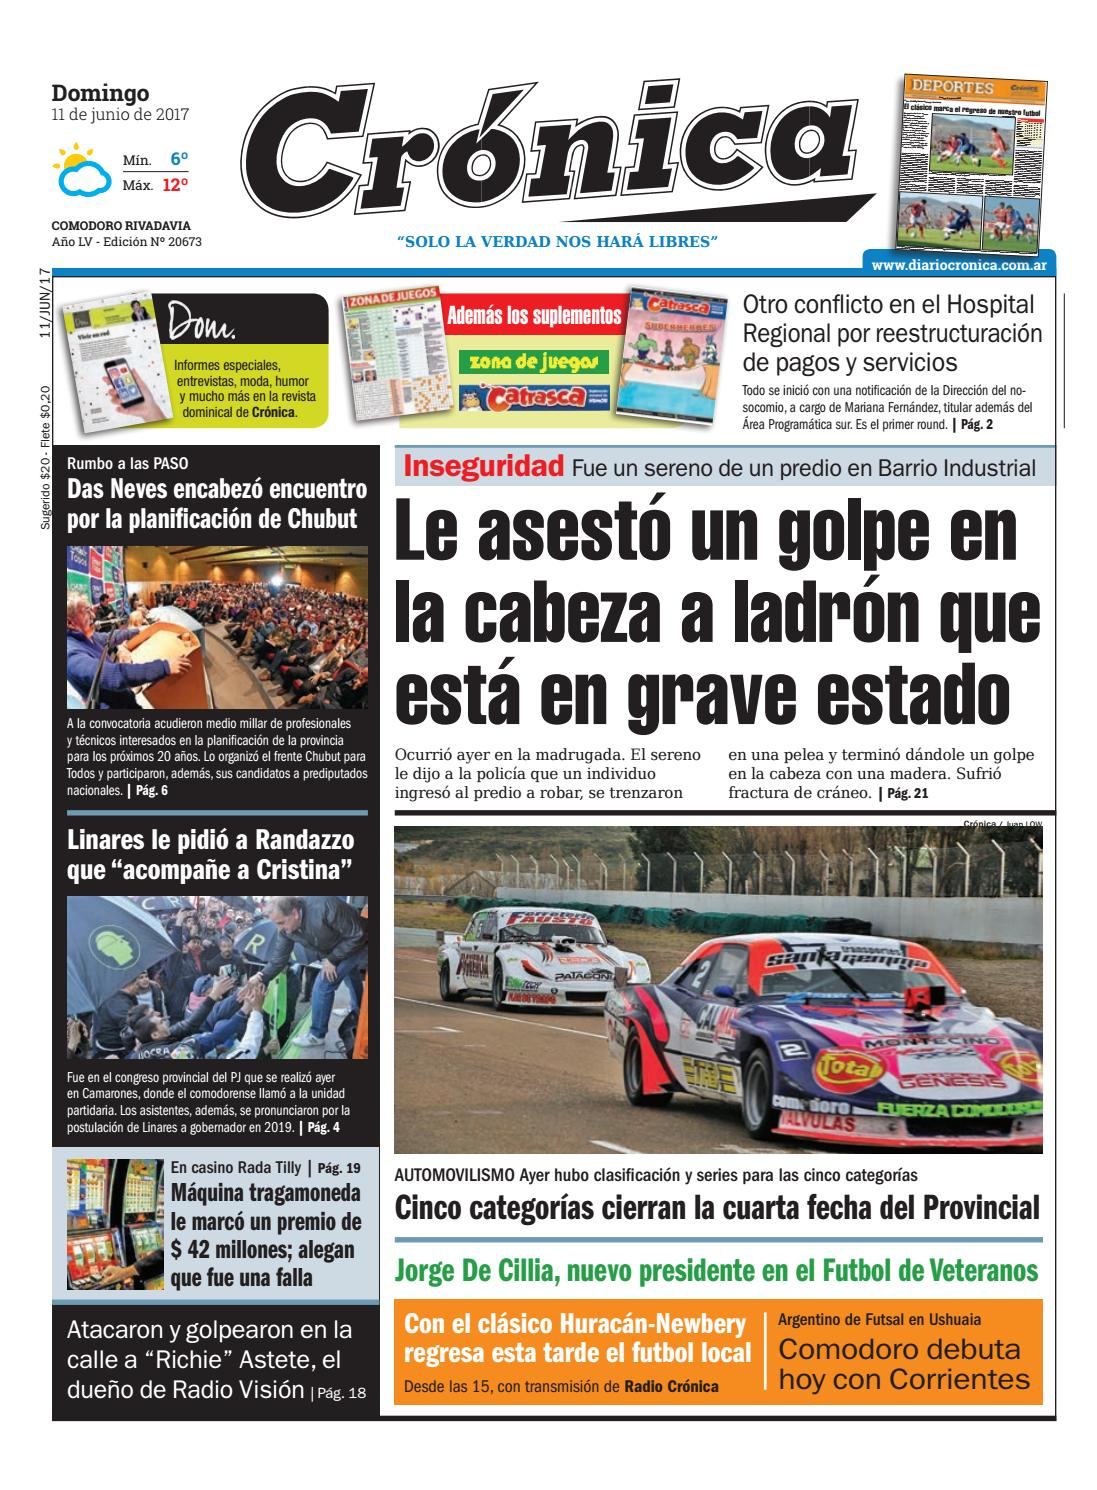 395ae69958cb6a663c5cb99c2ae23c5e by Diario Crónica - issuu 7ebb203dab1